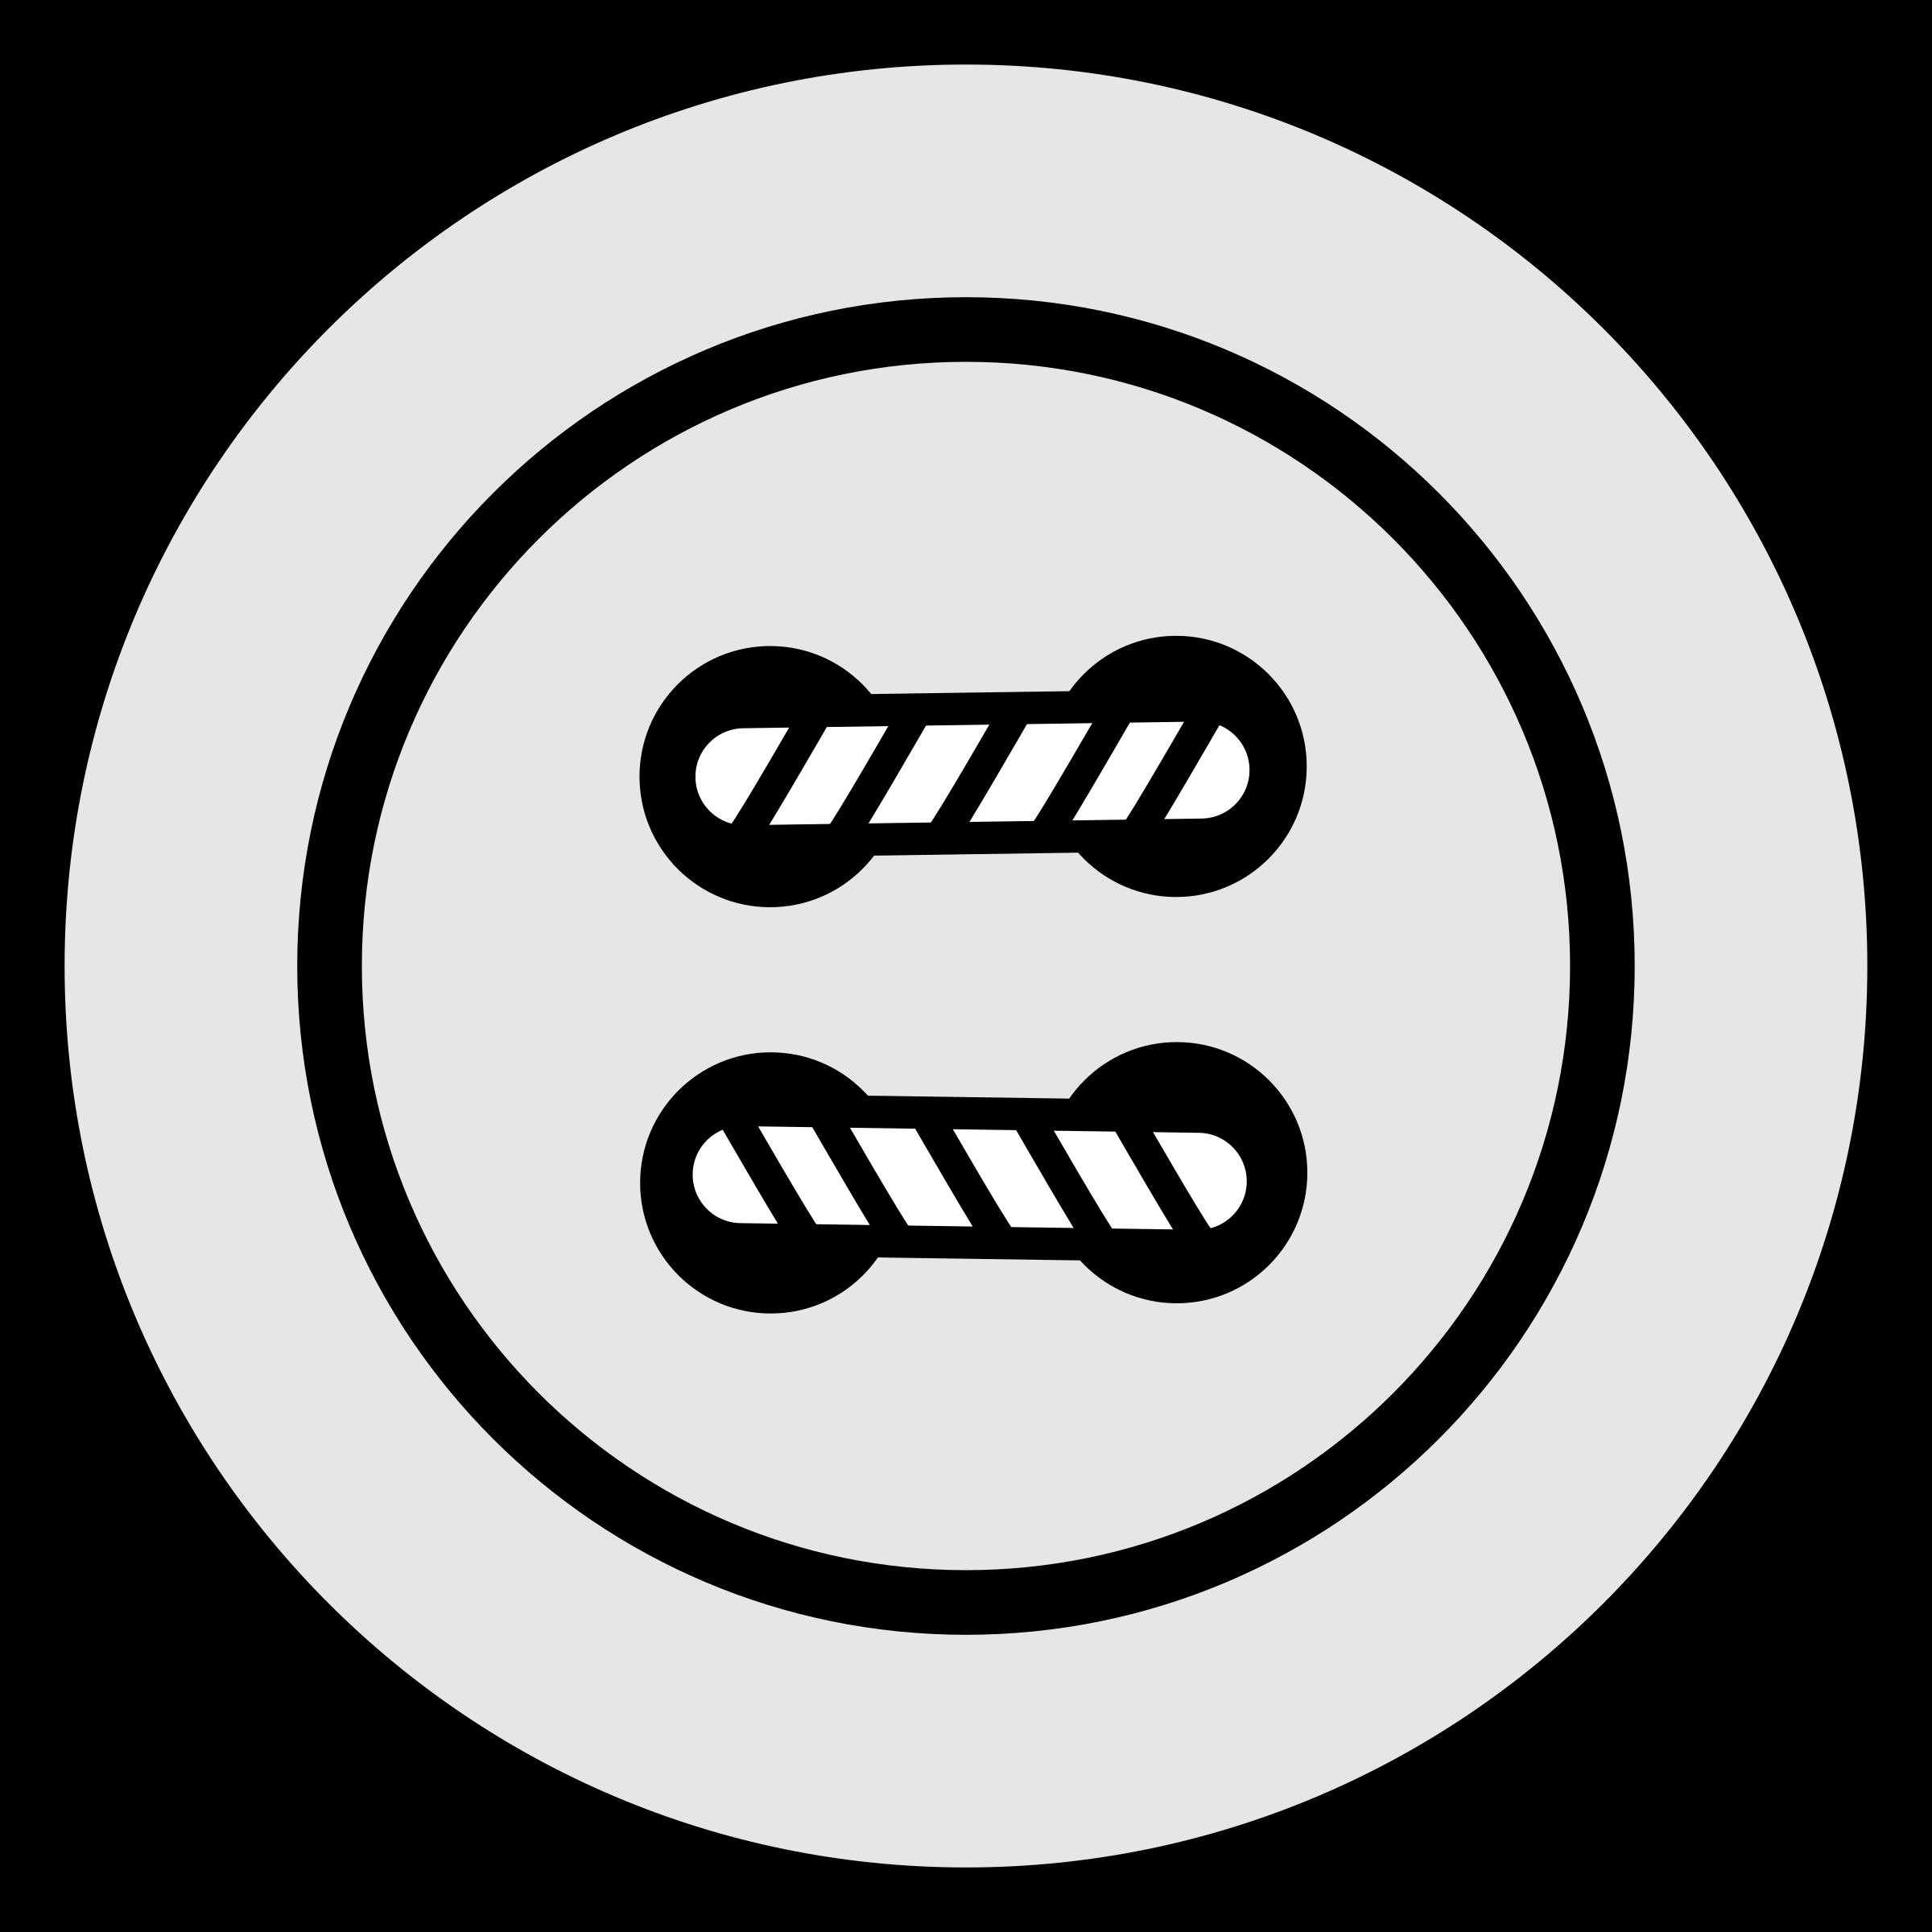 Button Clipart Black And White.